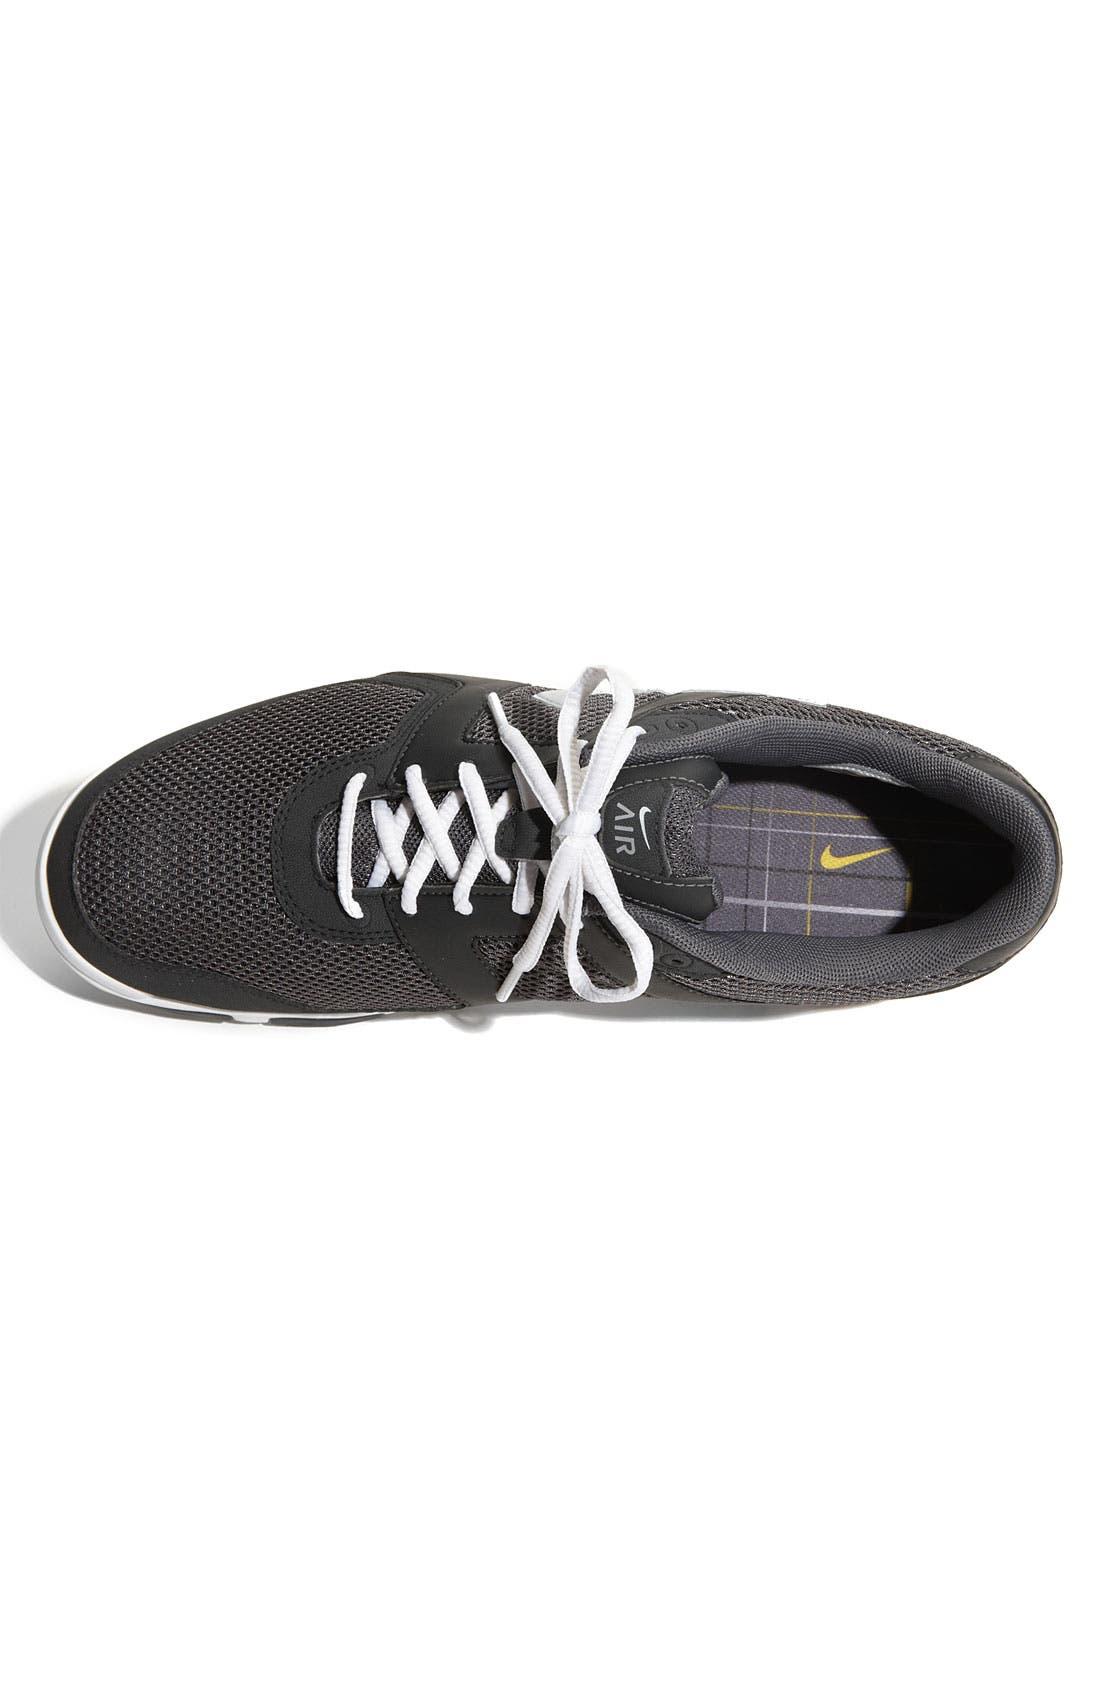 Alternate Image 3  - Nike 'Air Range WP' Golf Shoe (Men)